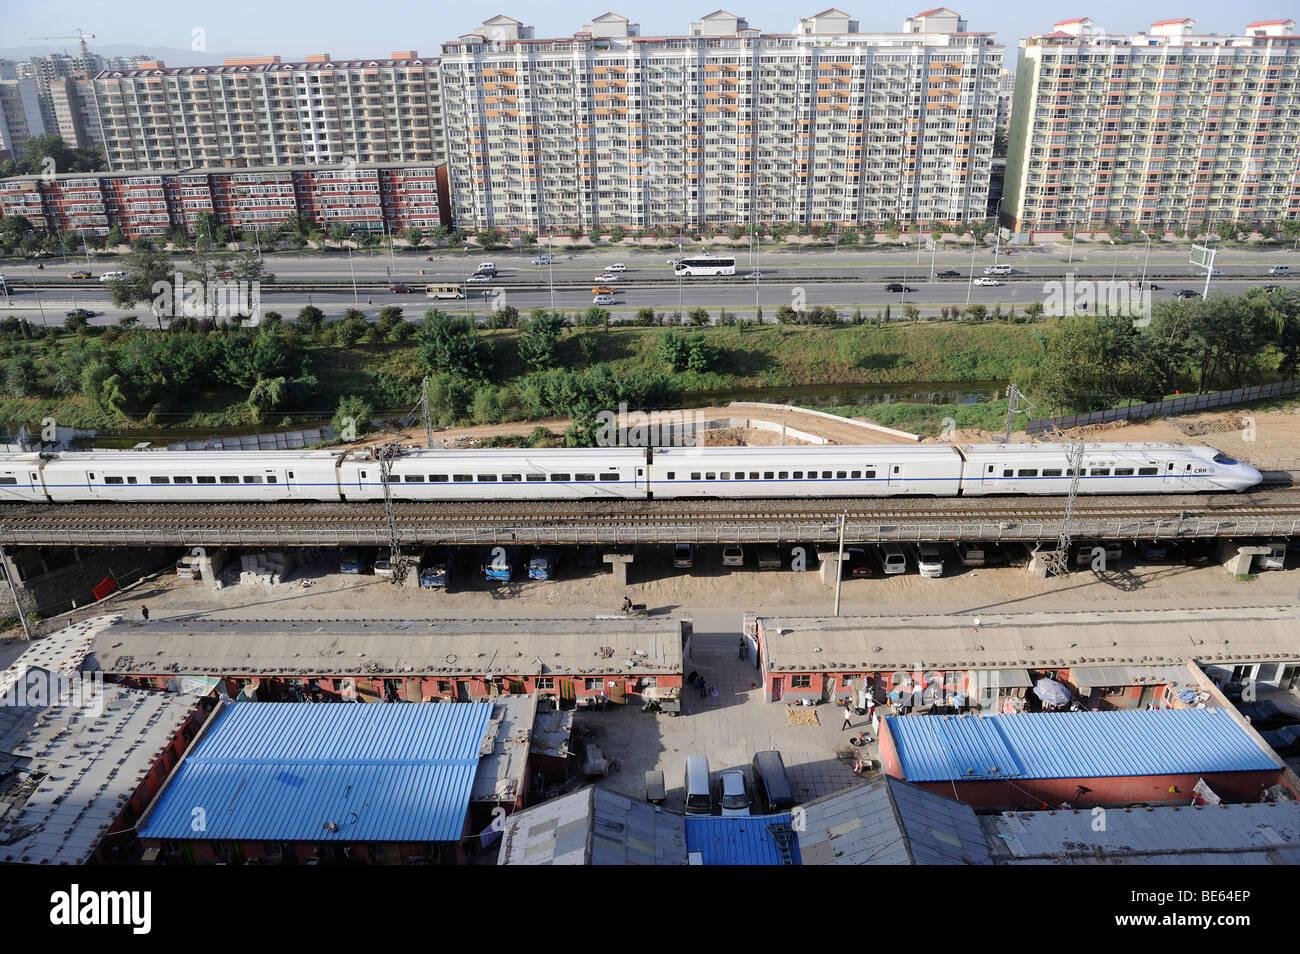 A CRH (China Railway High-speed) bullet train through Beijing city. 21-Sep-2009 - Stock Image